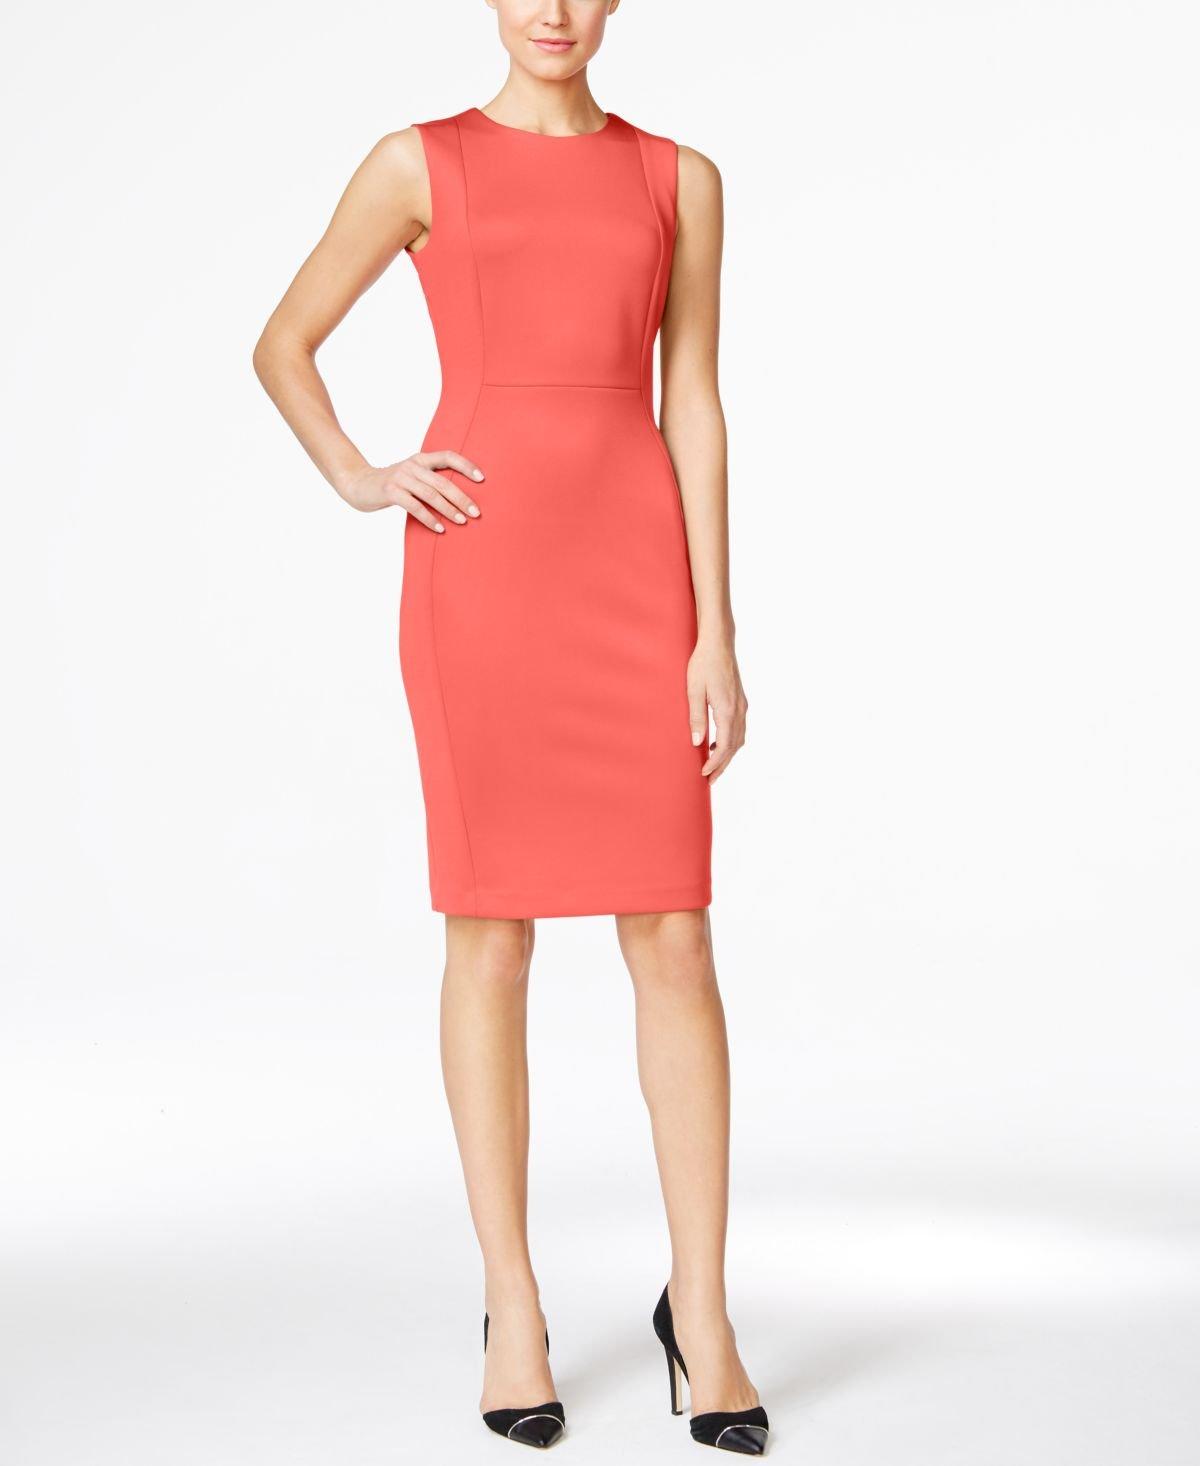 Calvin Klein Women's Seamed Sleeveless Sheath Dress, Watermelon, 6